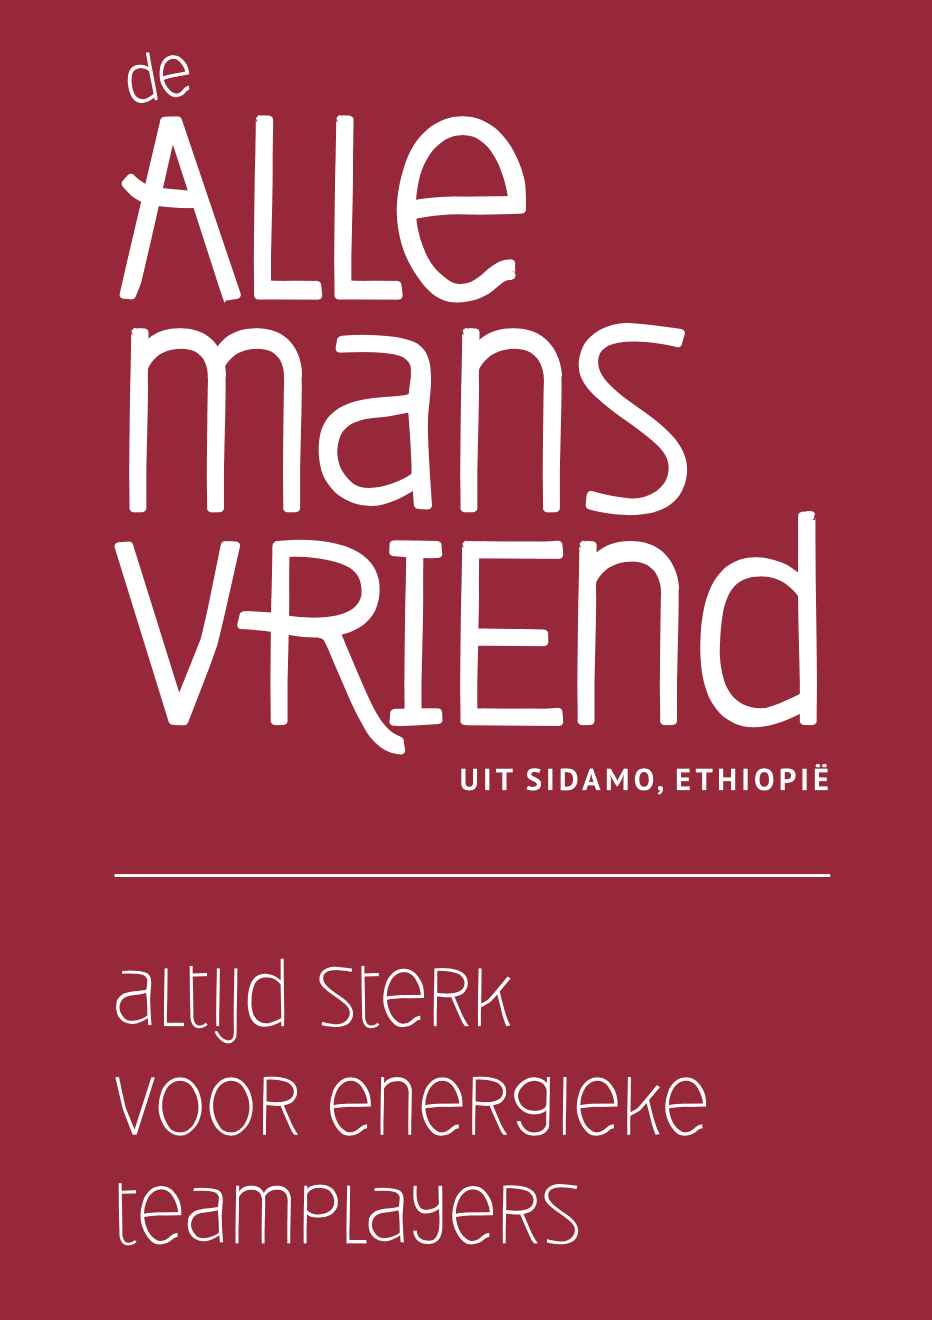 De Ethiopische Allemansvriend koffie van Pure Africa